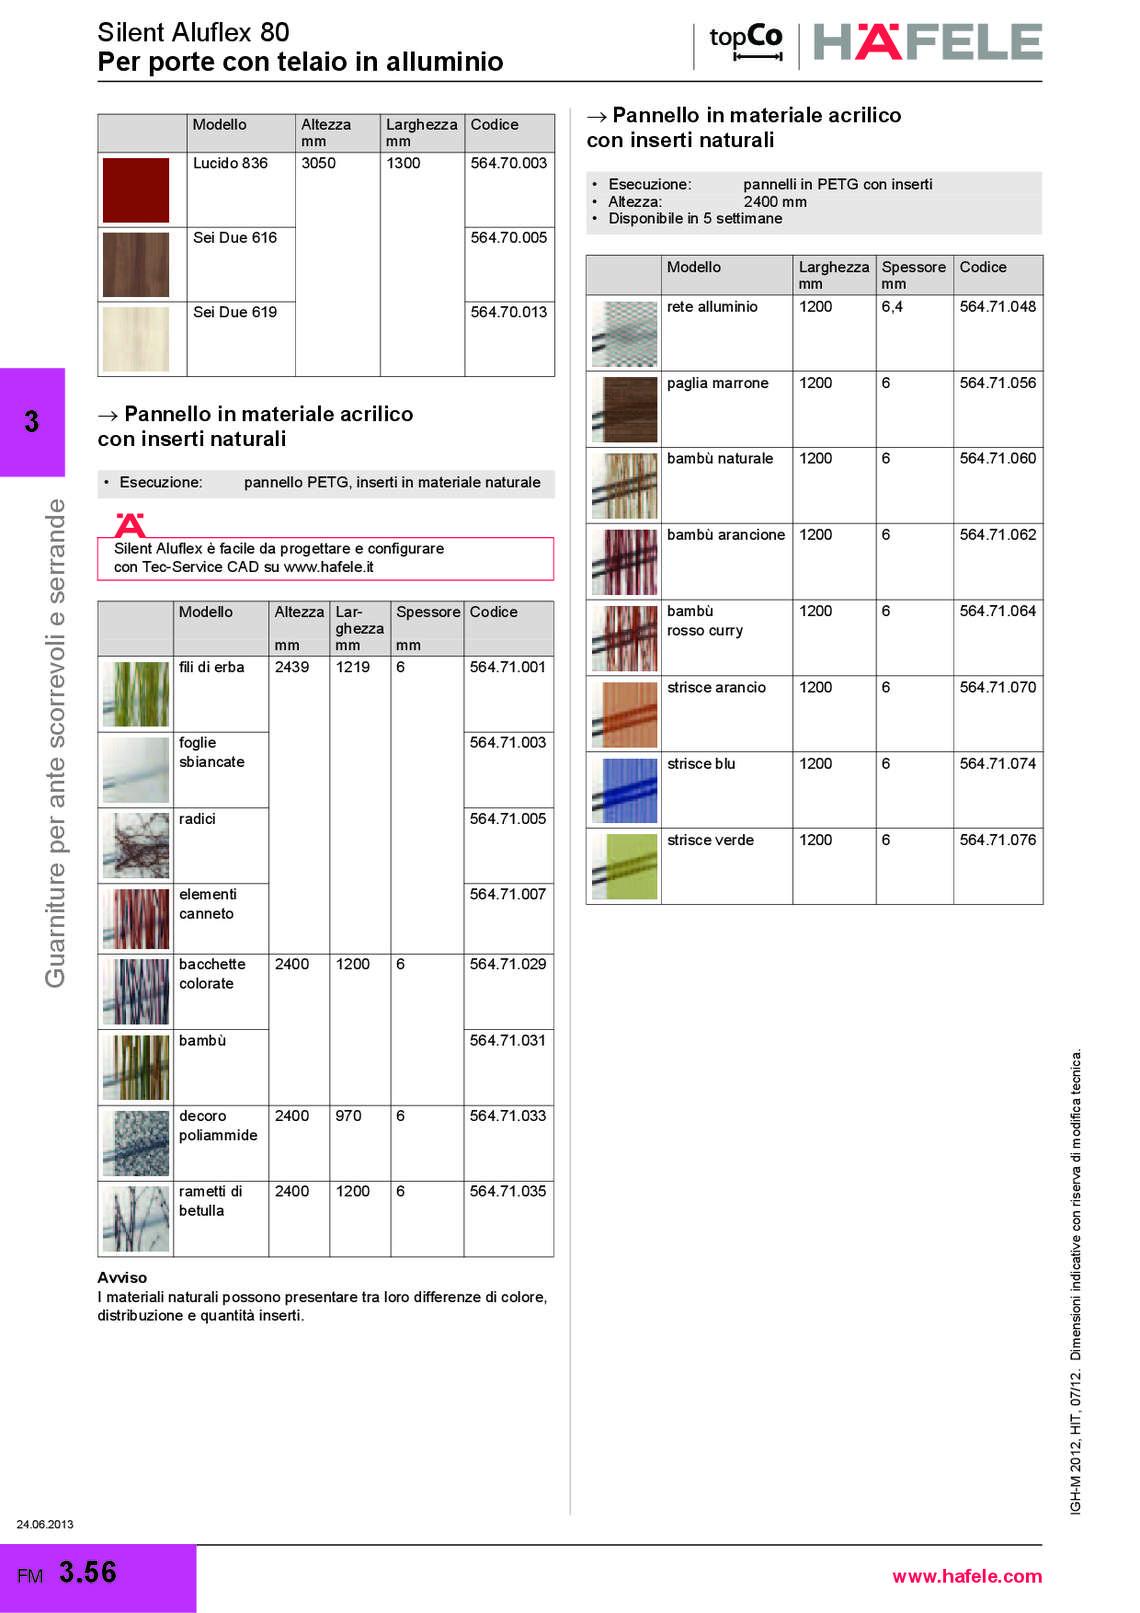 hafele-prodotti-su-misura_81_071.jpg